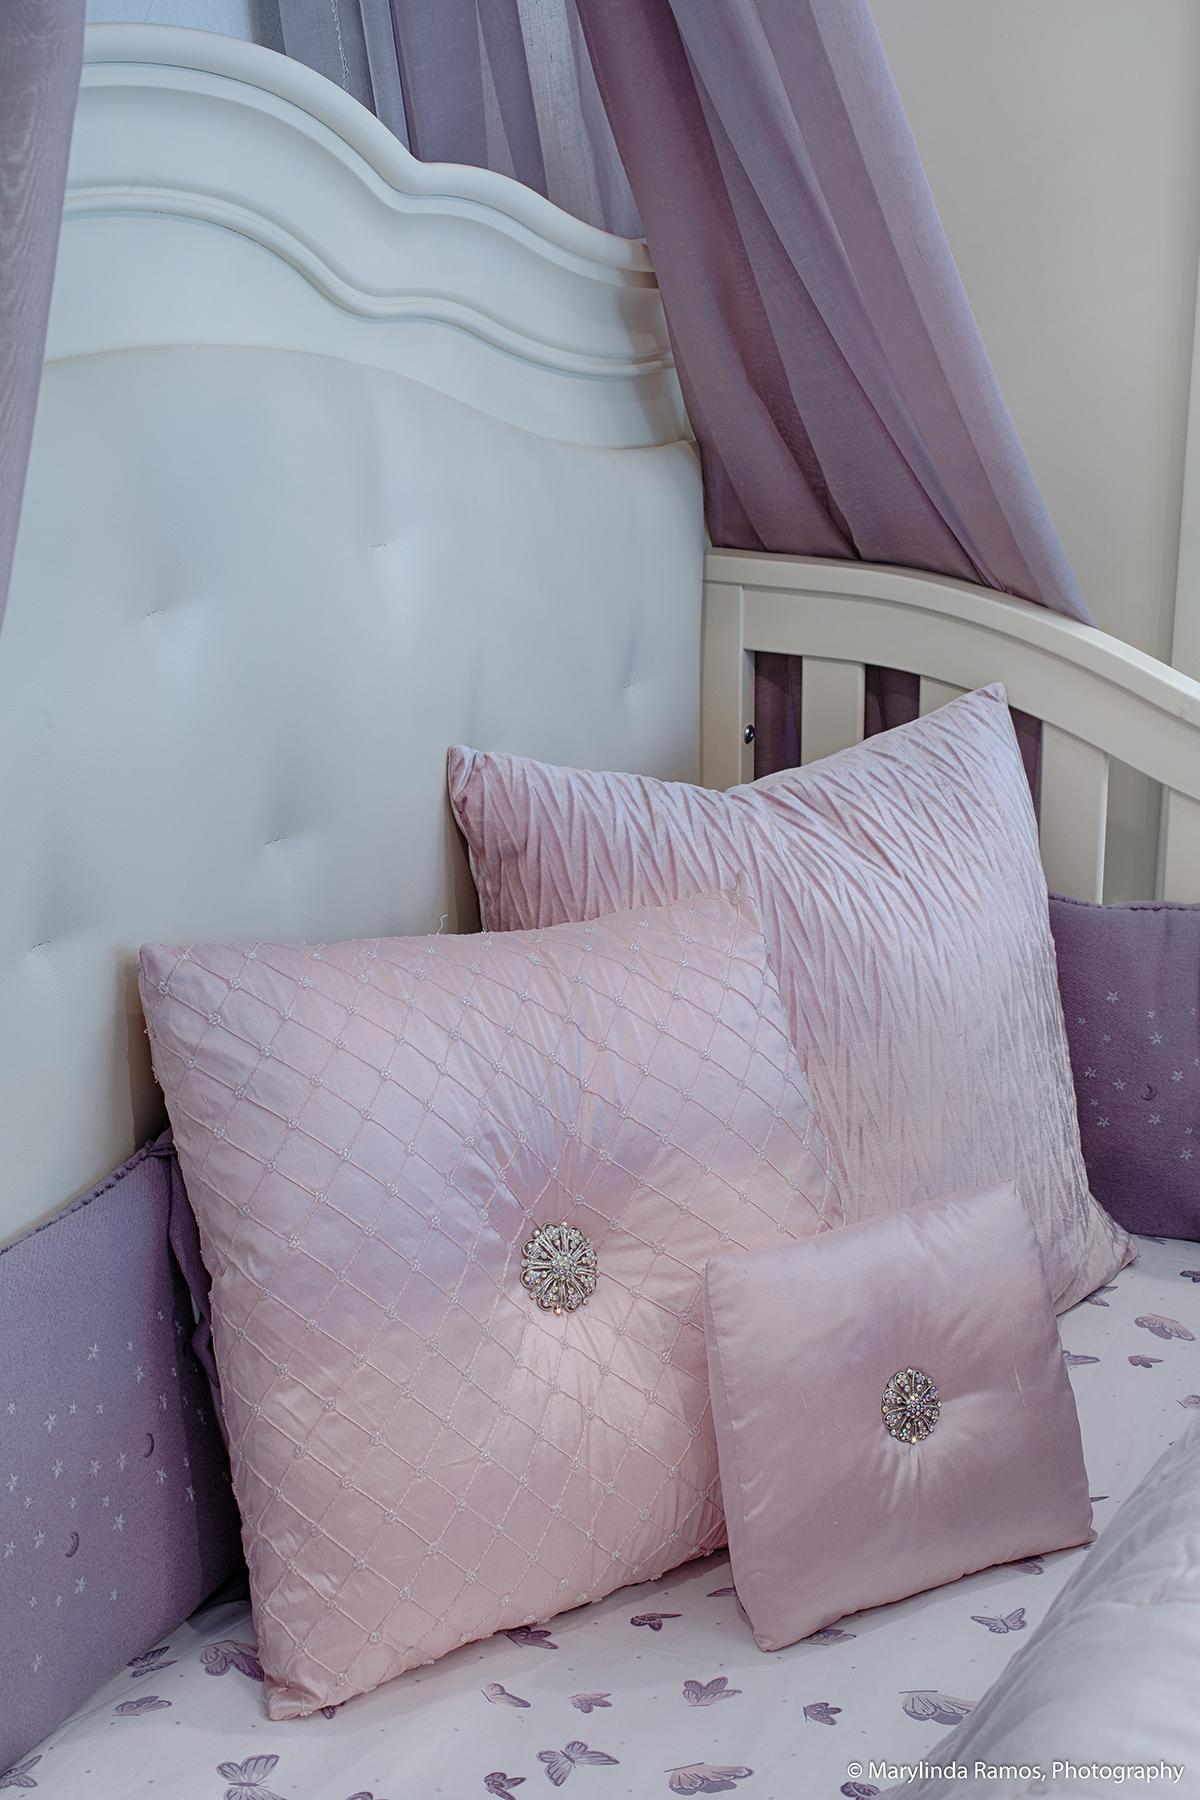 Classic Baby Nursery, Rooms by Eve, Eve Joss, Interior Design in Boca Raton, FL8.jpg